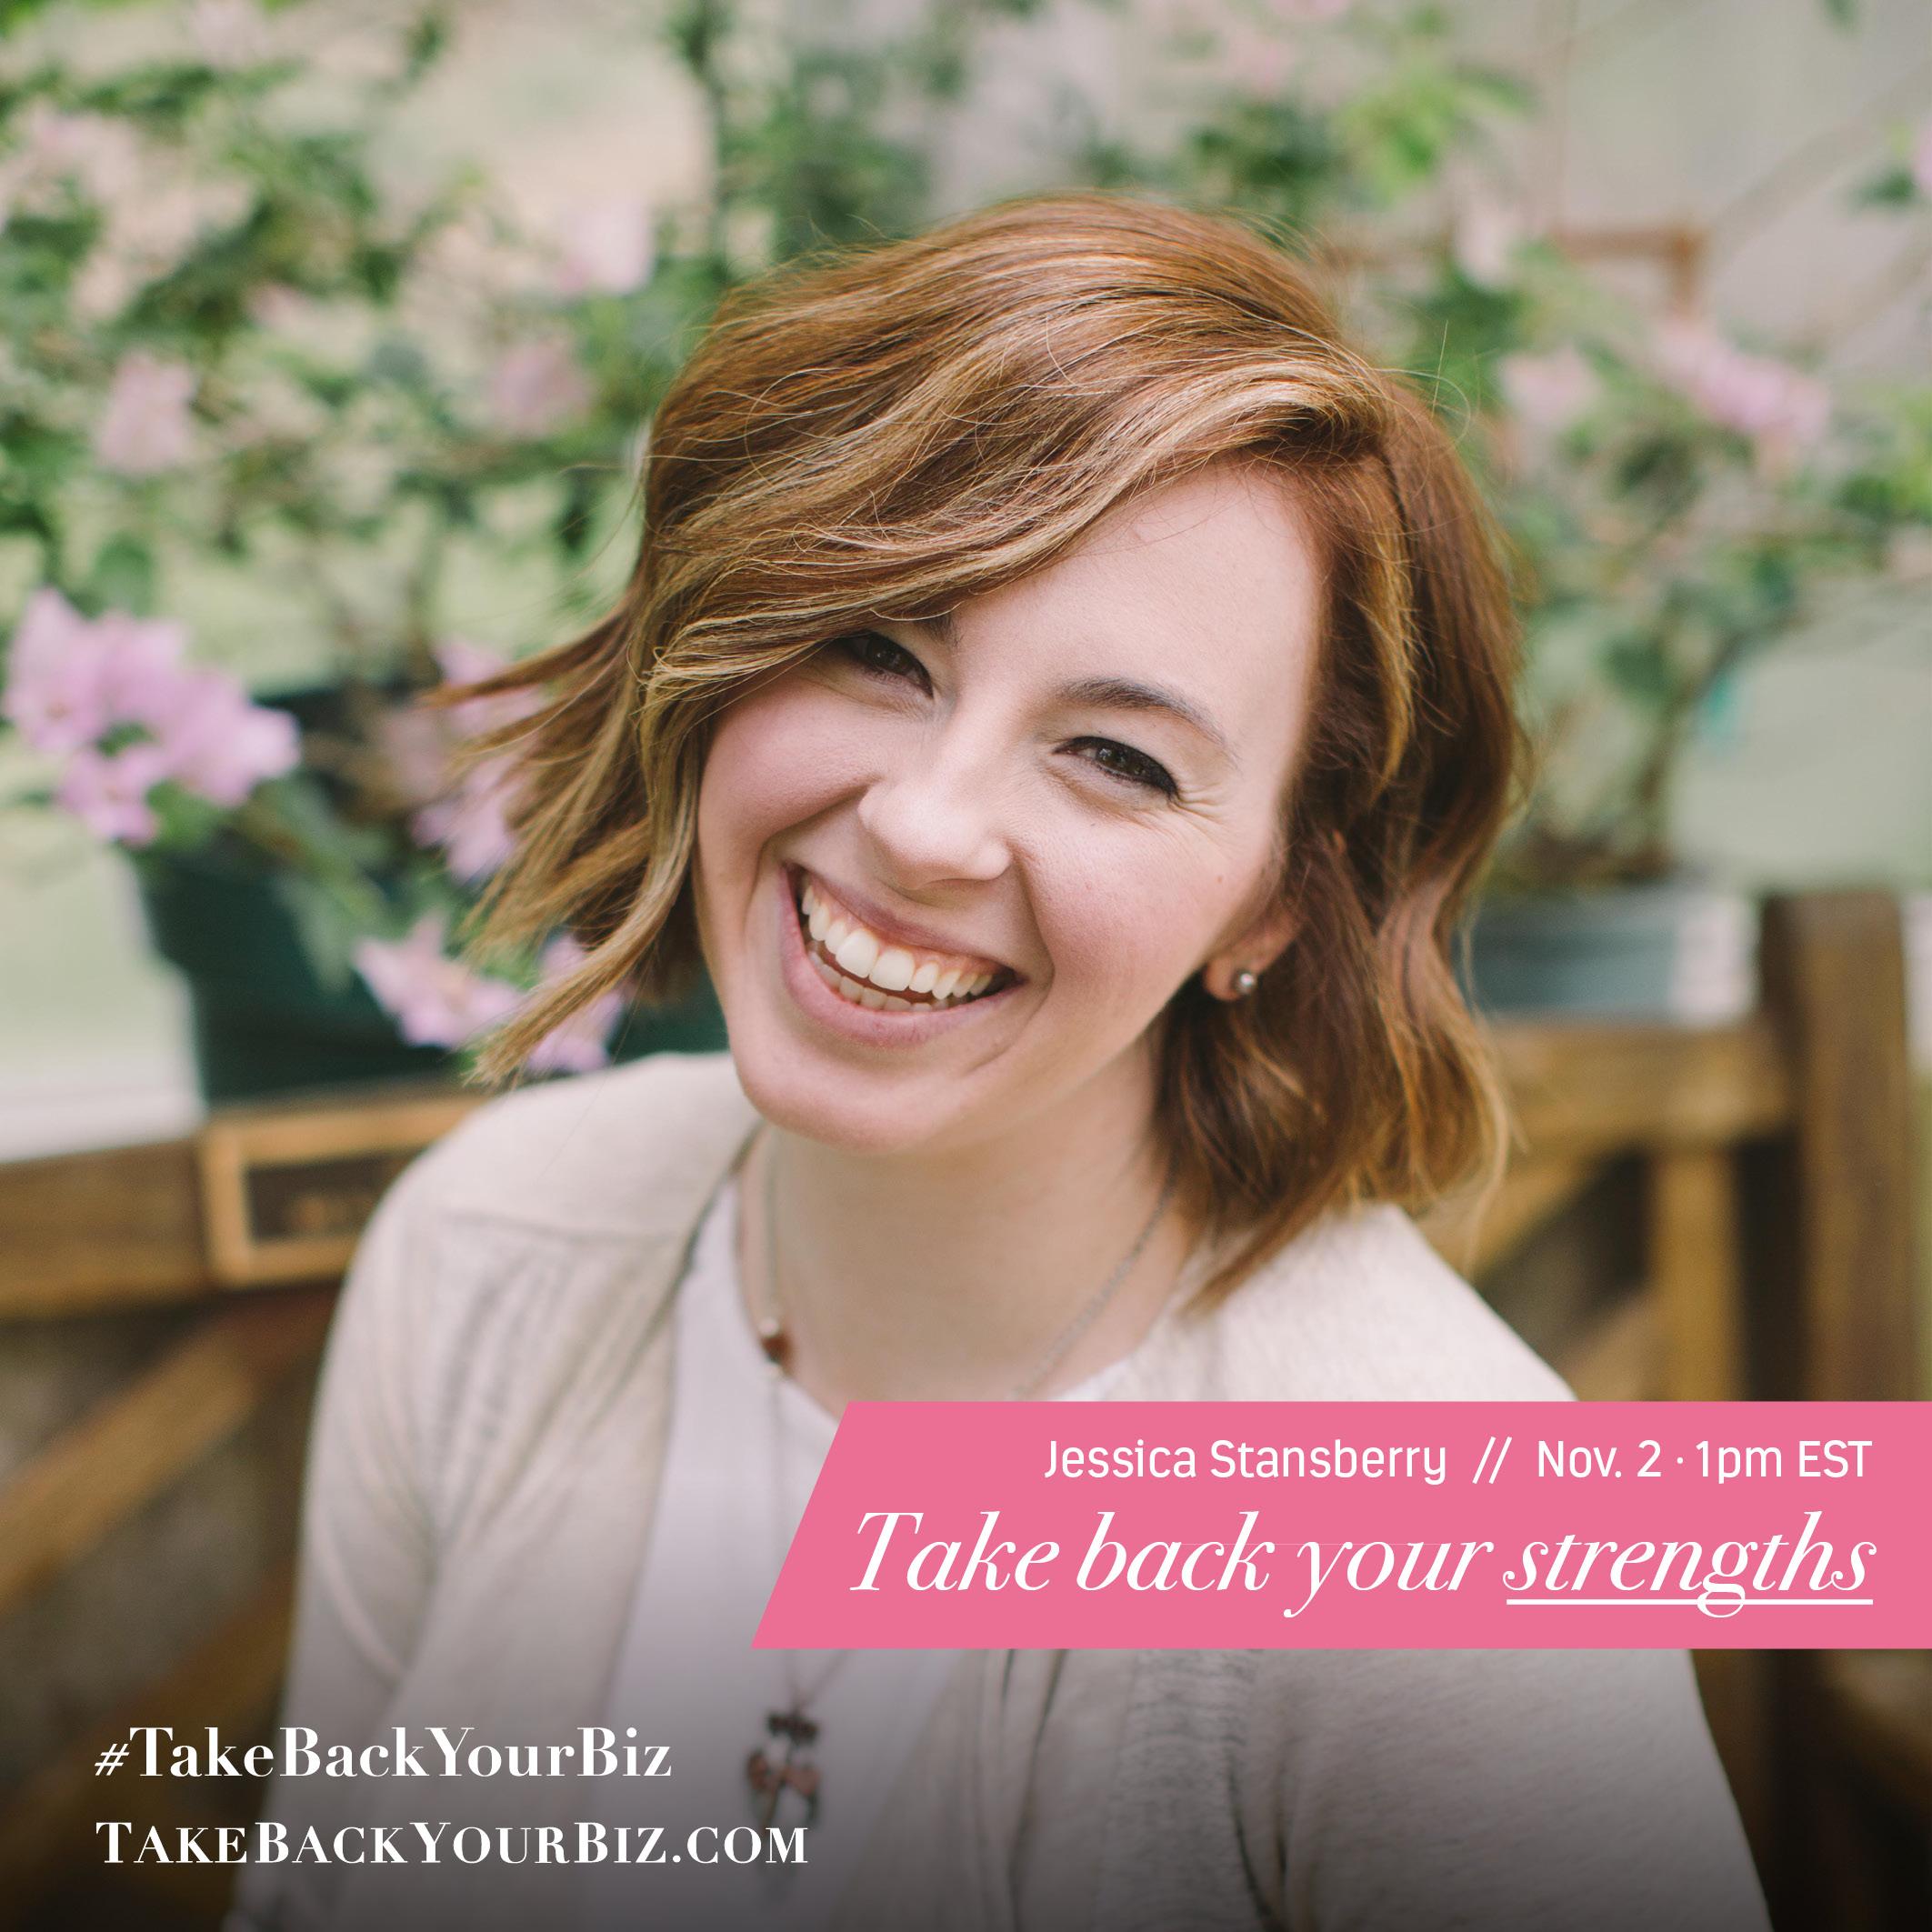 Take-Back-Your-Biz-Speakers-Jessica-Stansberry-VIDfulential